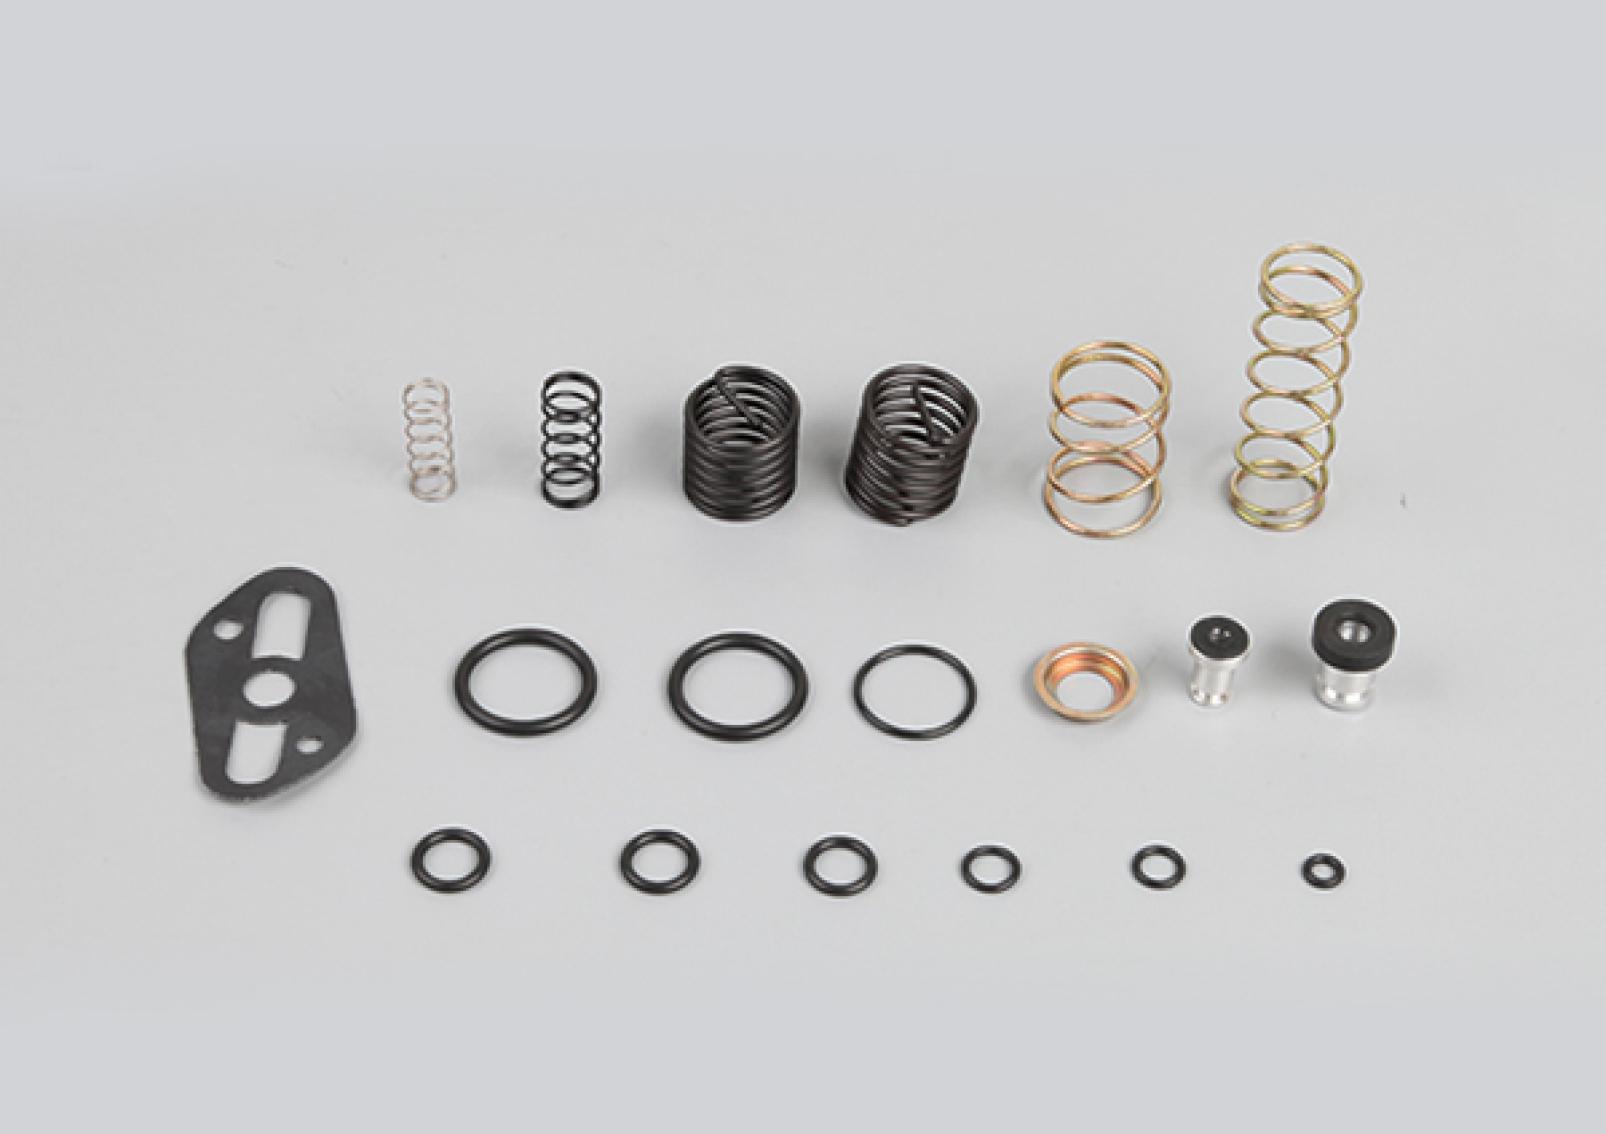 Hand Brake Valve Repair Kit, 961 722 007 2